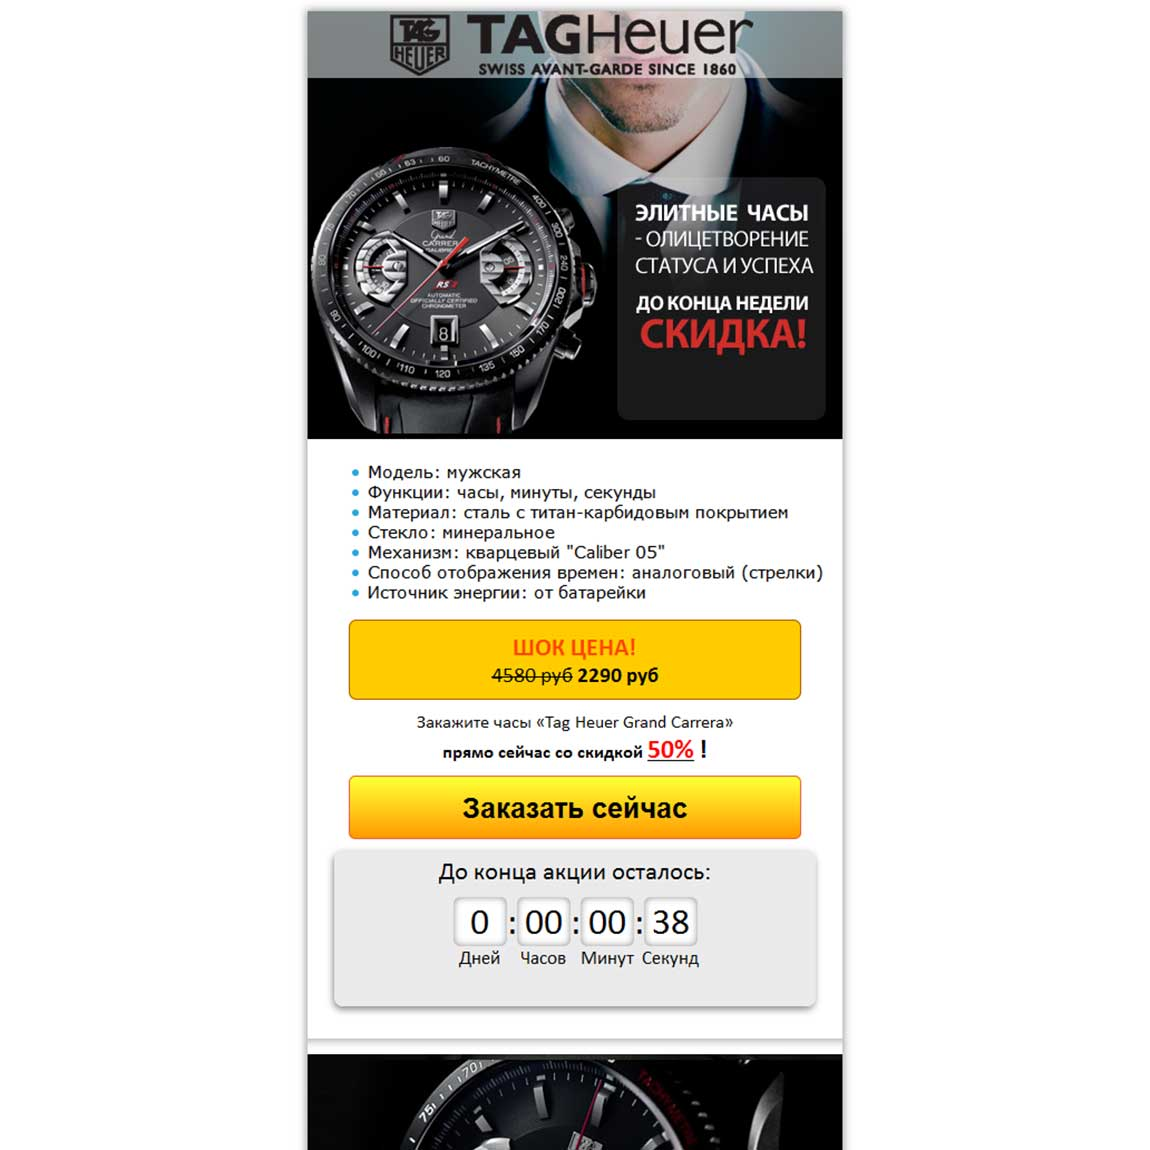 Миниатюра Лендинга Часы Tag Heuer Grand Carrera 002